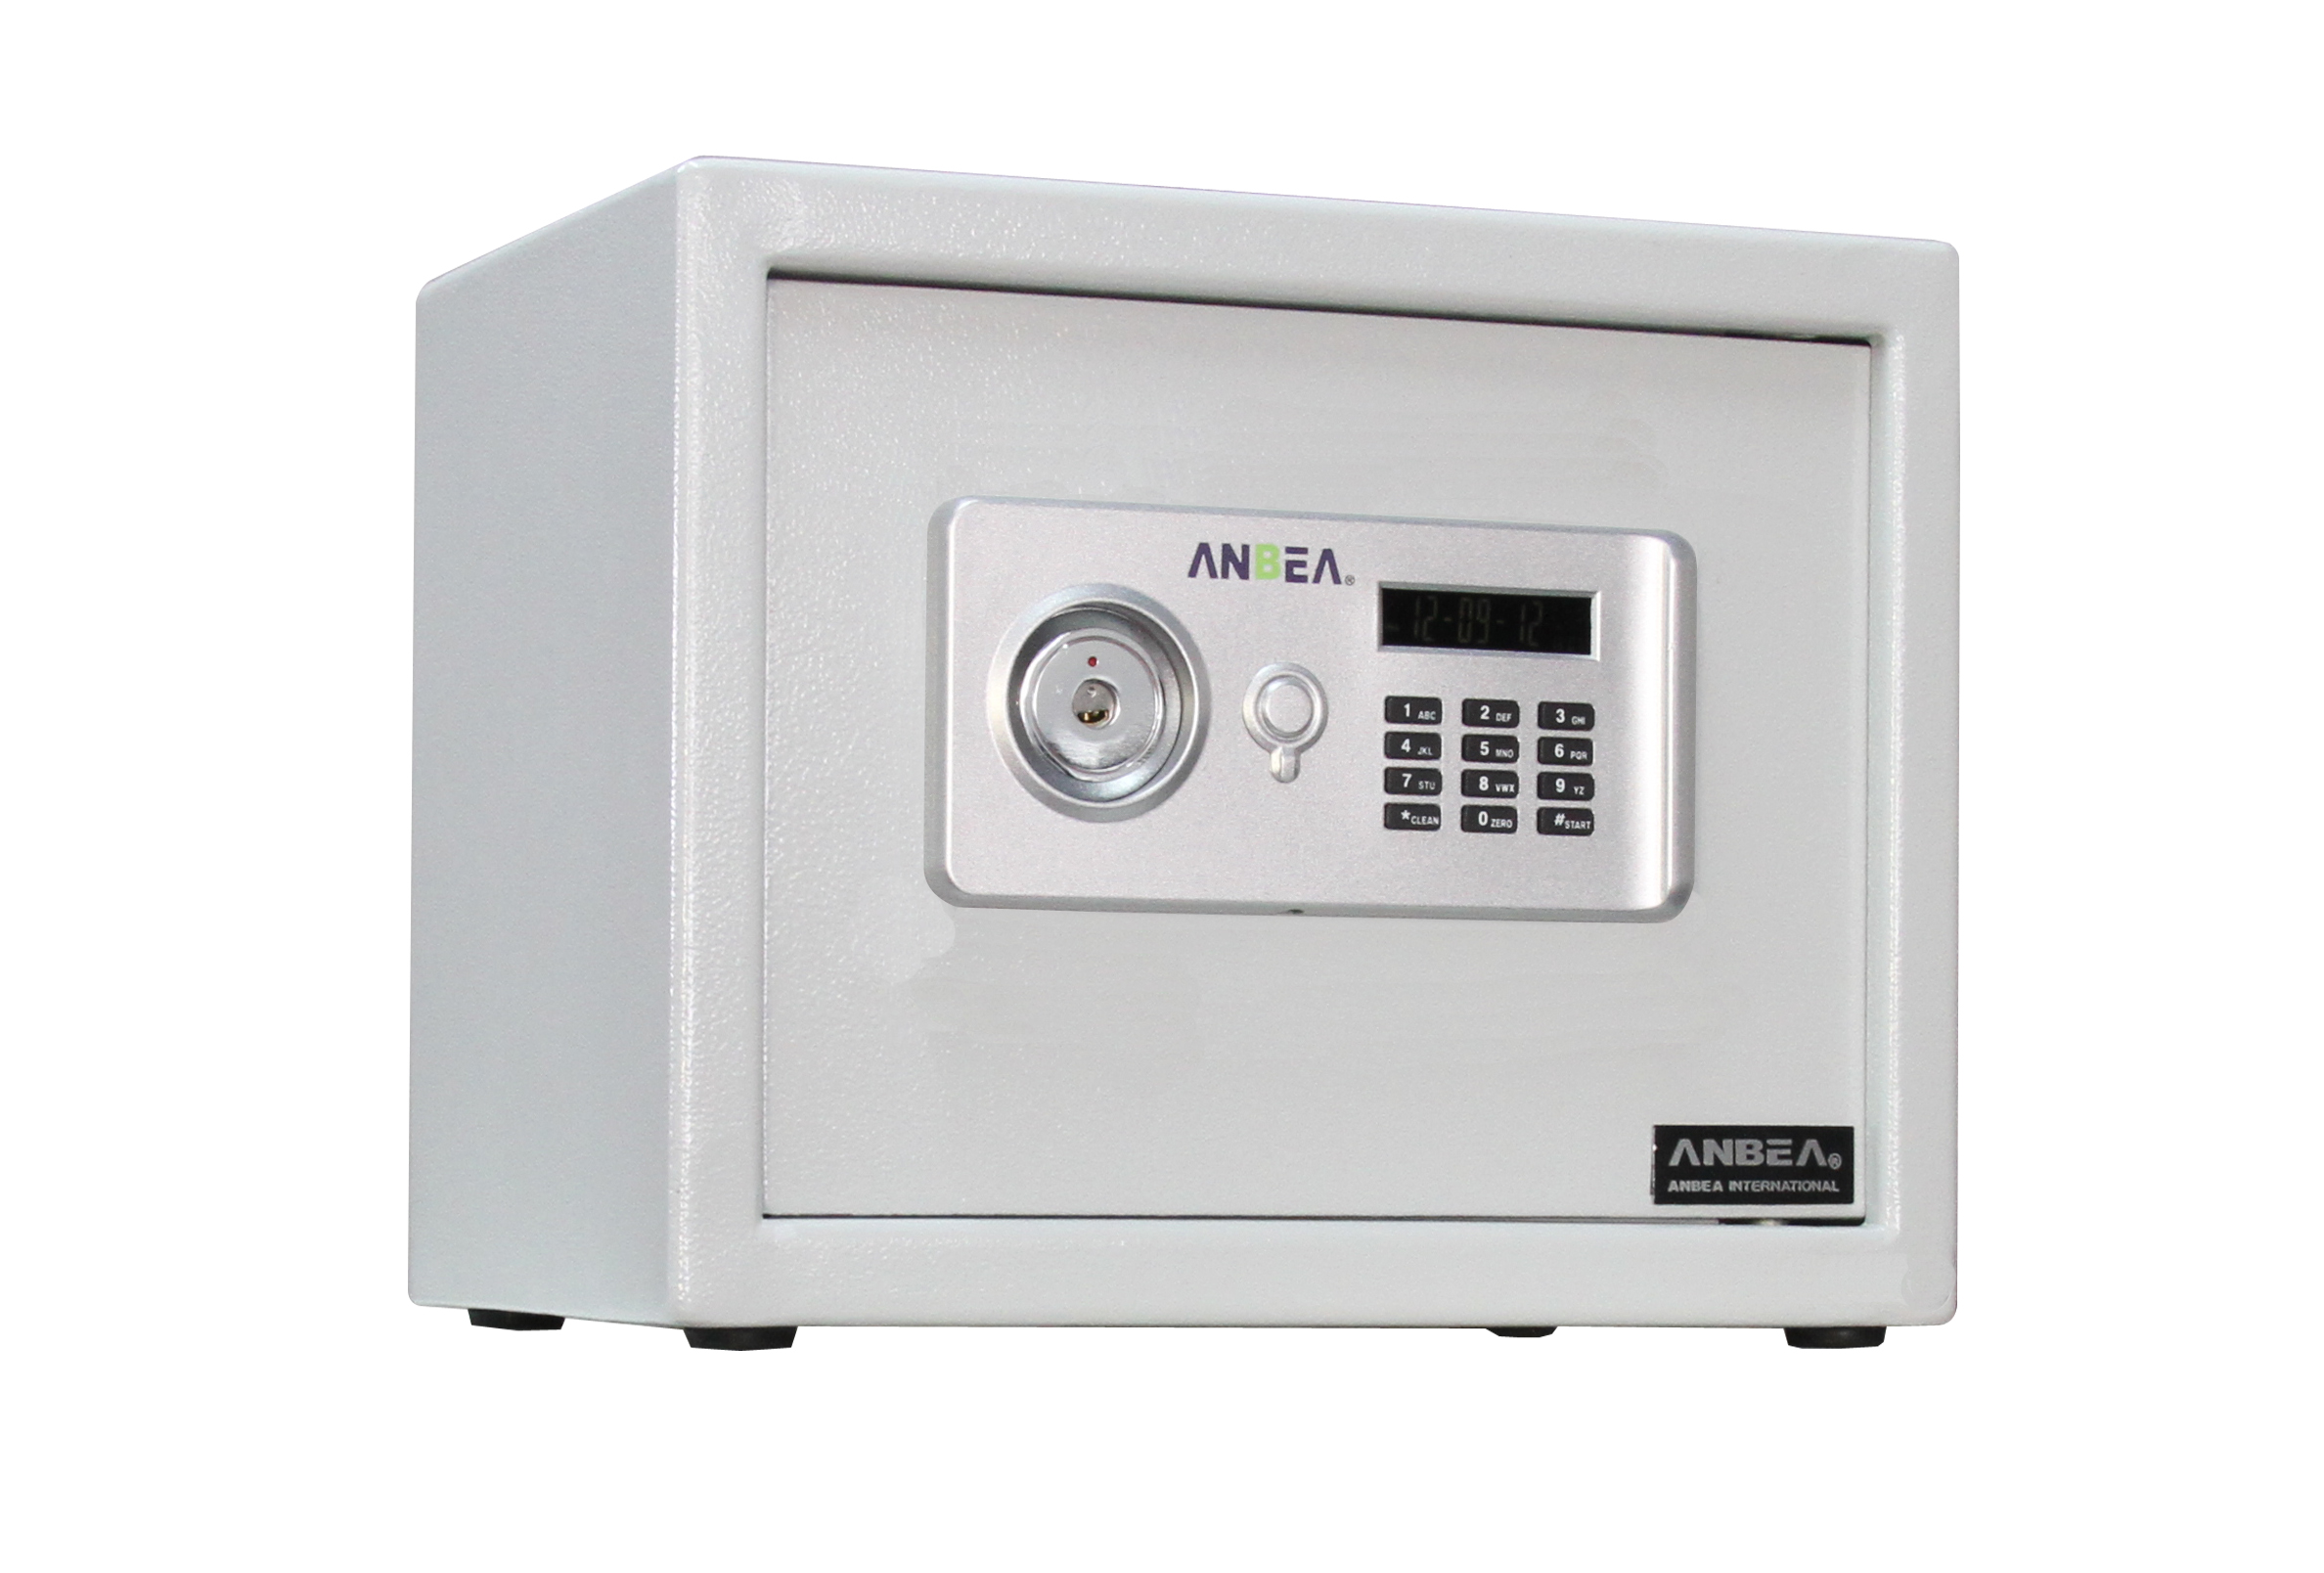 BB-30 ELECTRONIC LOCK SAFE BOX